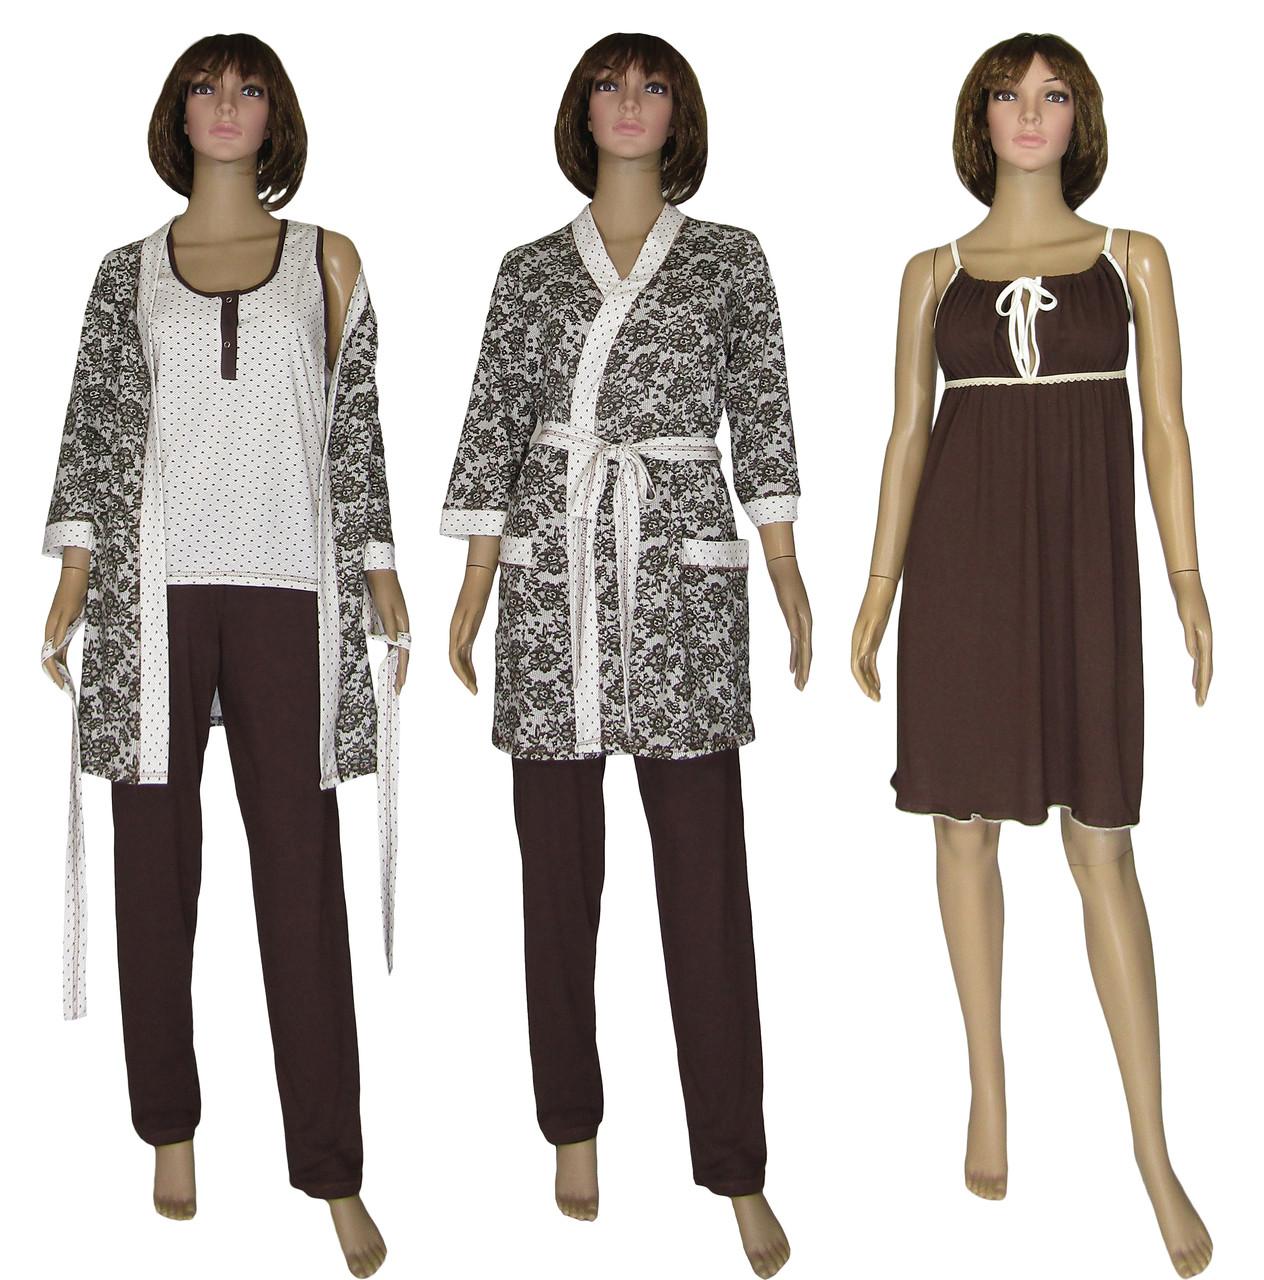 Ночная рубашка, пижама с брюками и халат 18077 MindViol Slivki Agure